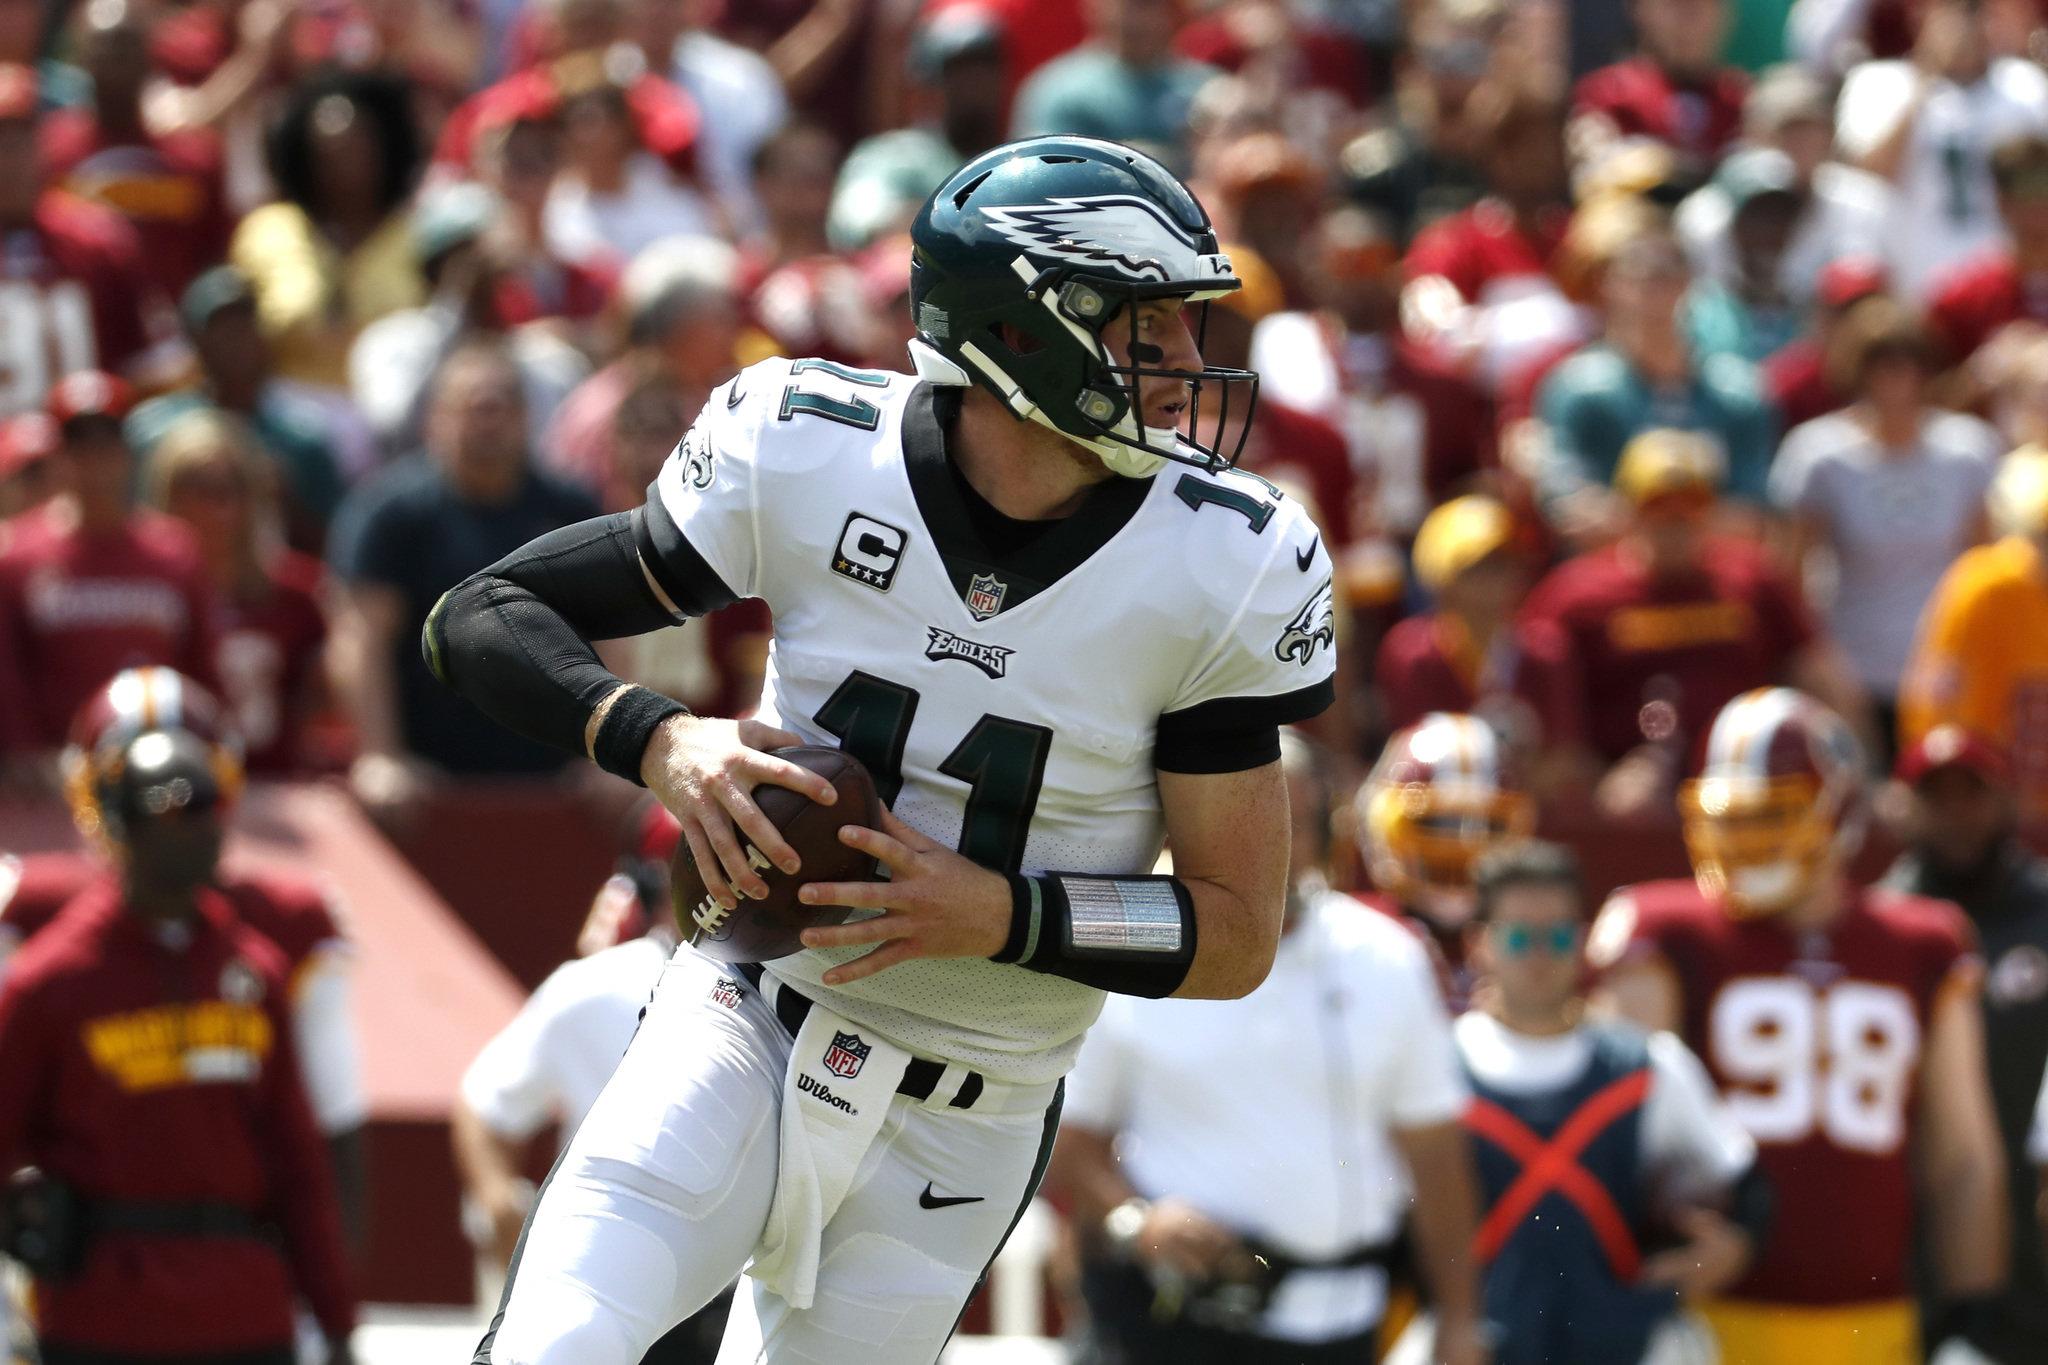 [NFL] Week 1: catch Wentz if you can (Philadelphia Eagles vs Washington Redskins 30-17)